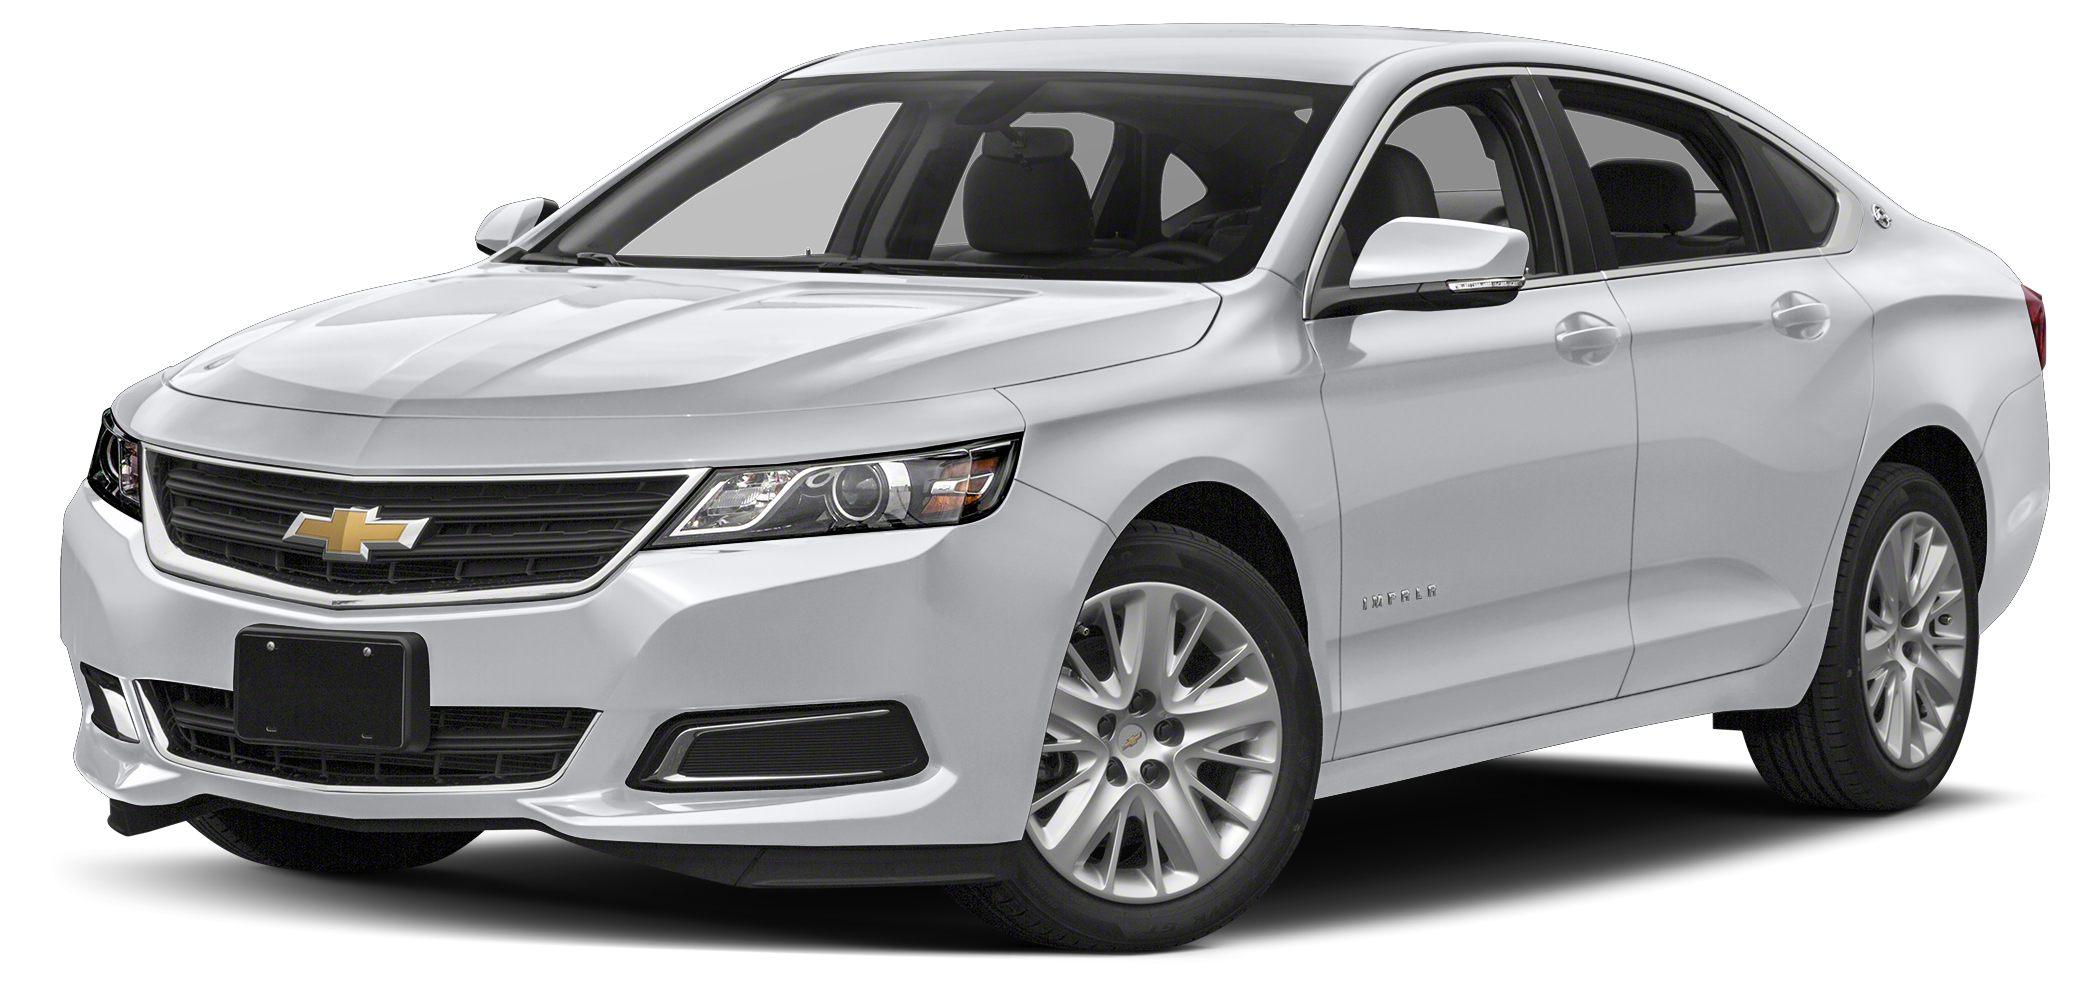 2018 Chevrolet Impala LS w1LS Price includes 1000 - General Motors Consumer Cash Program C